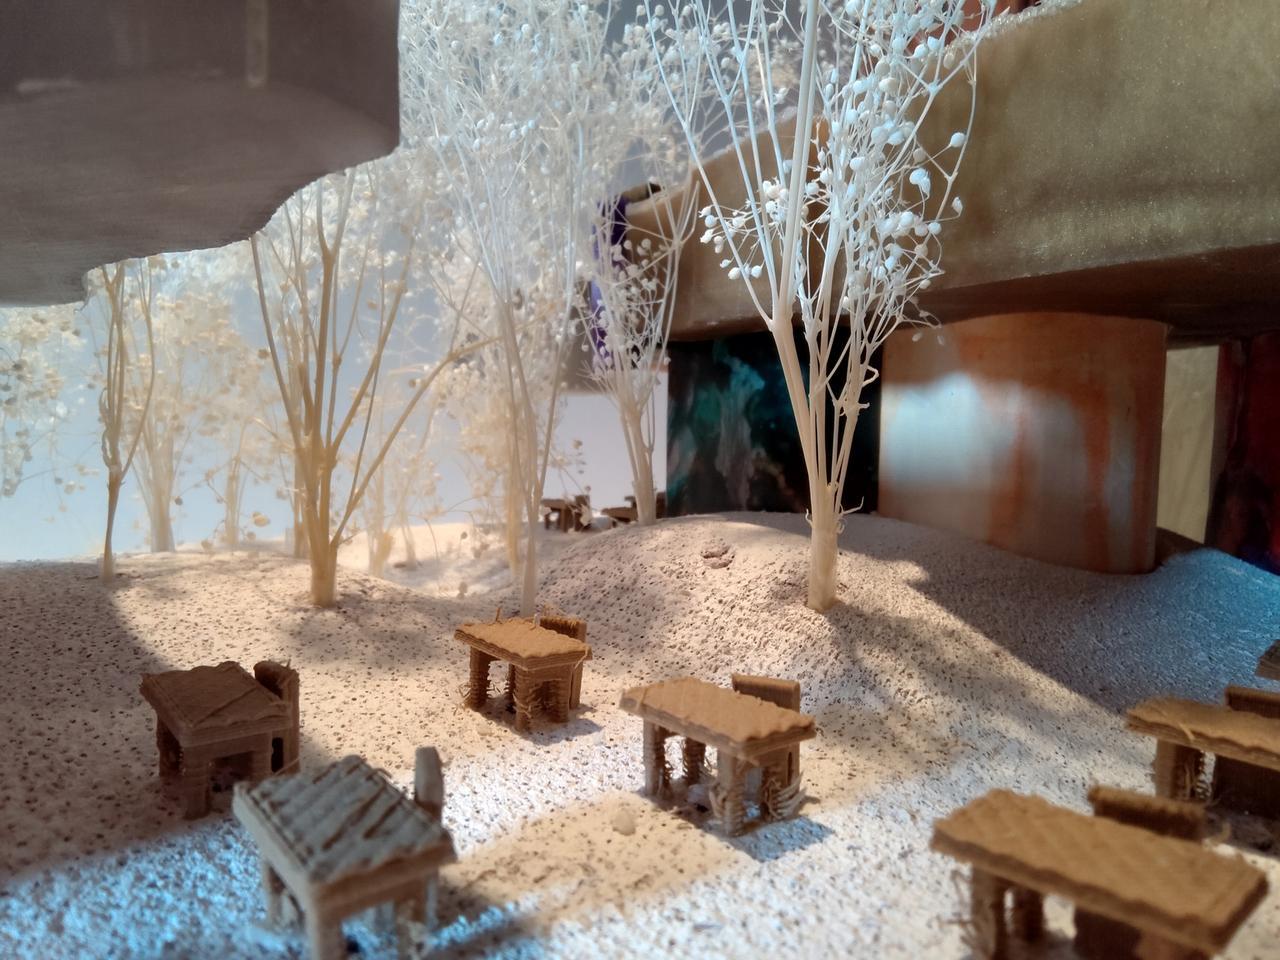 Interior design, Furniture, Branch, Decoration, Tree, Table, Lighting, Wood, Plant, Building